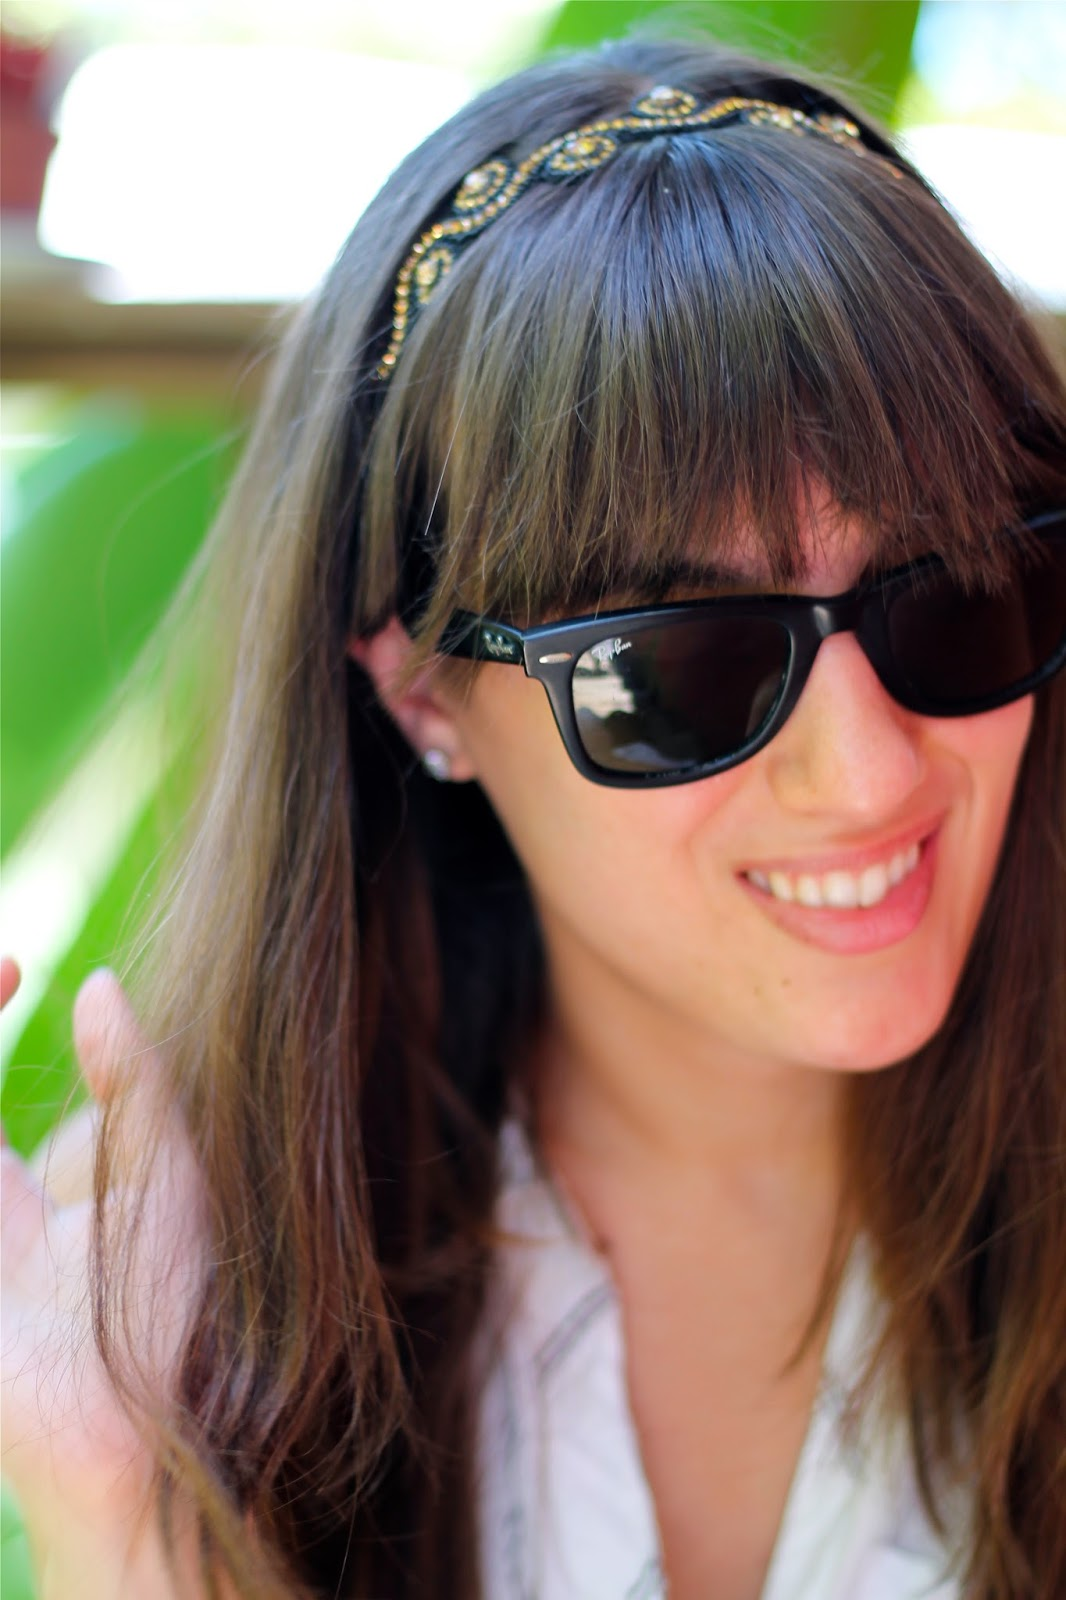 Tassel, fashion blog, fashion blogger, style blog, style blogger, Miami style, Miami fashion, look book, summer style, Miami fashion blogger